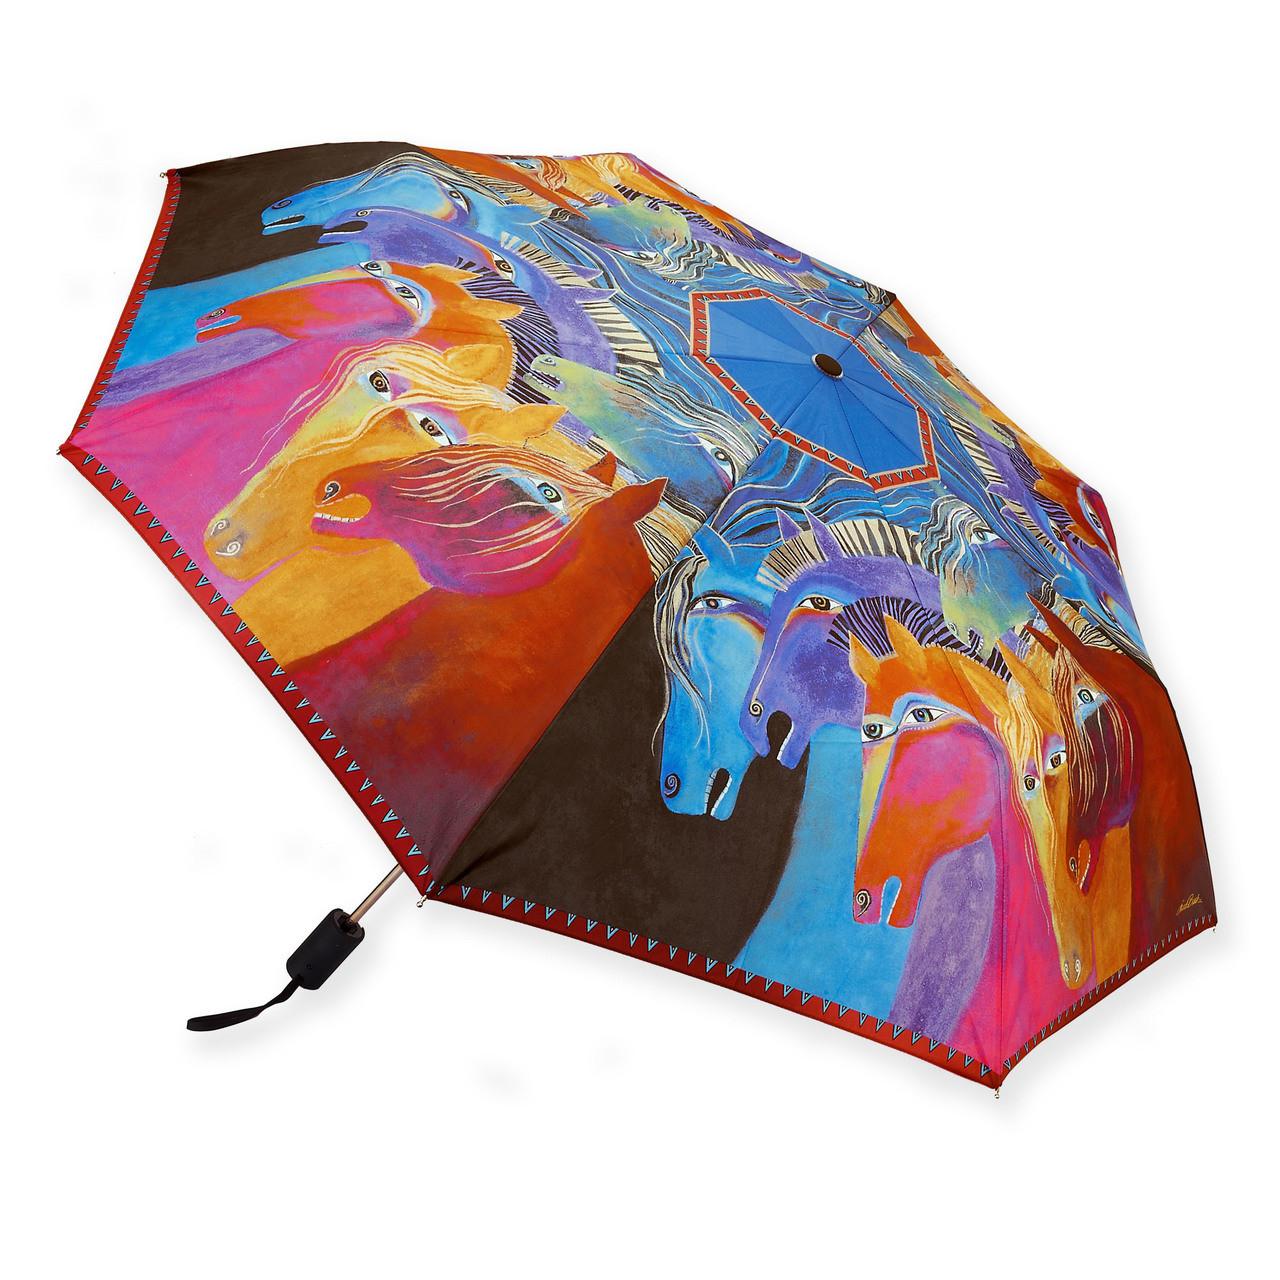 Umbrellas as Fashion Accessories: How to Choose an Umbrella forecasting